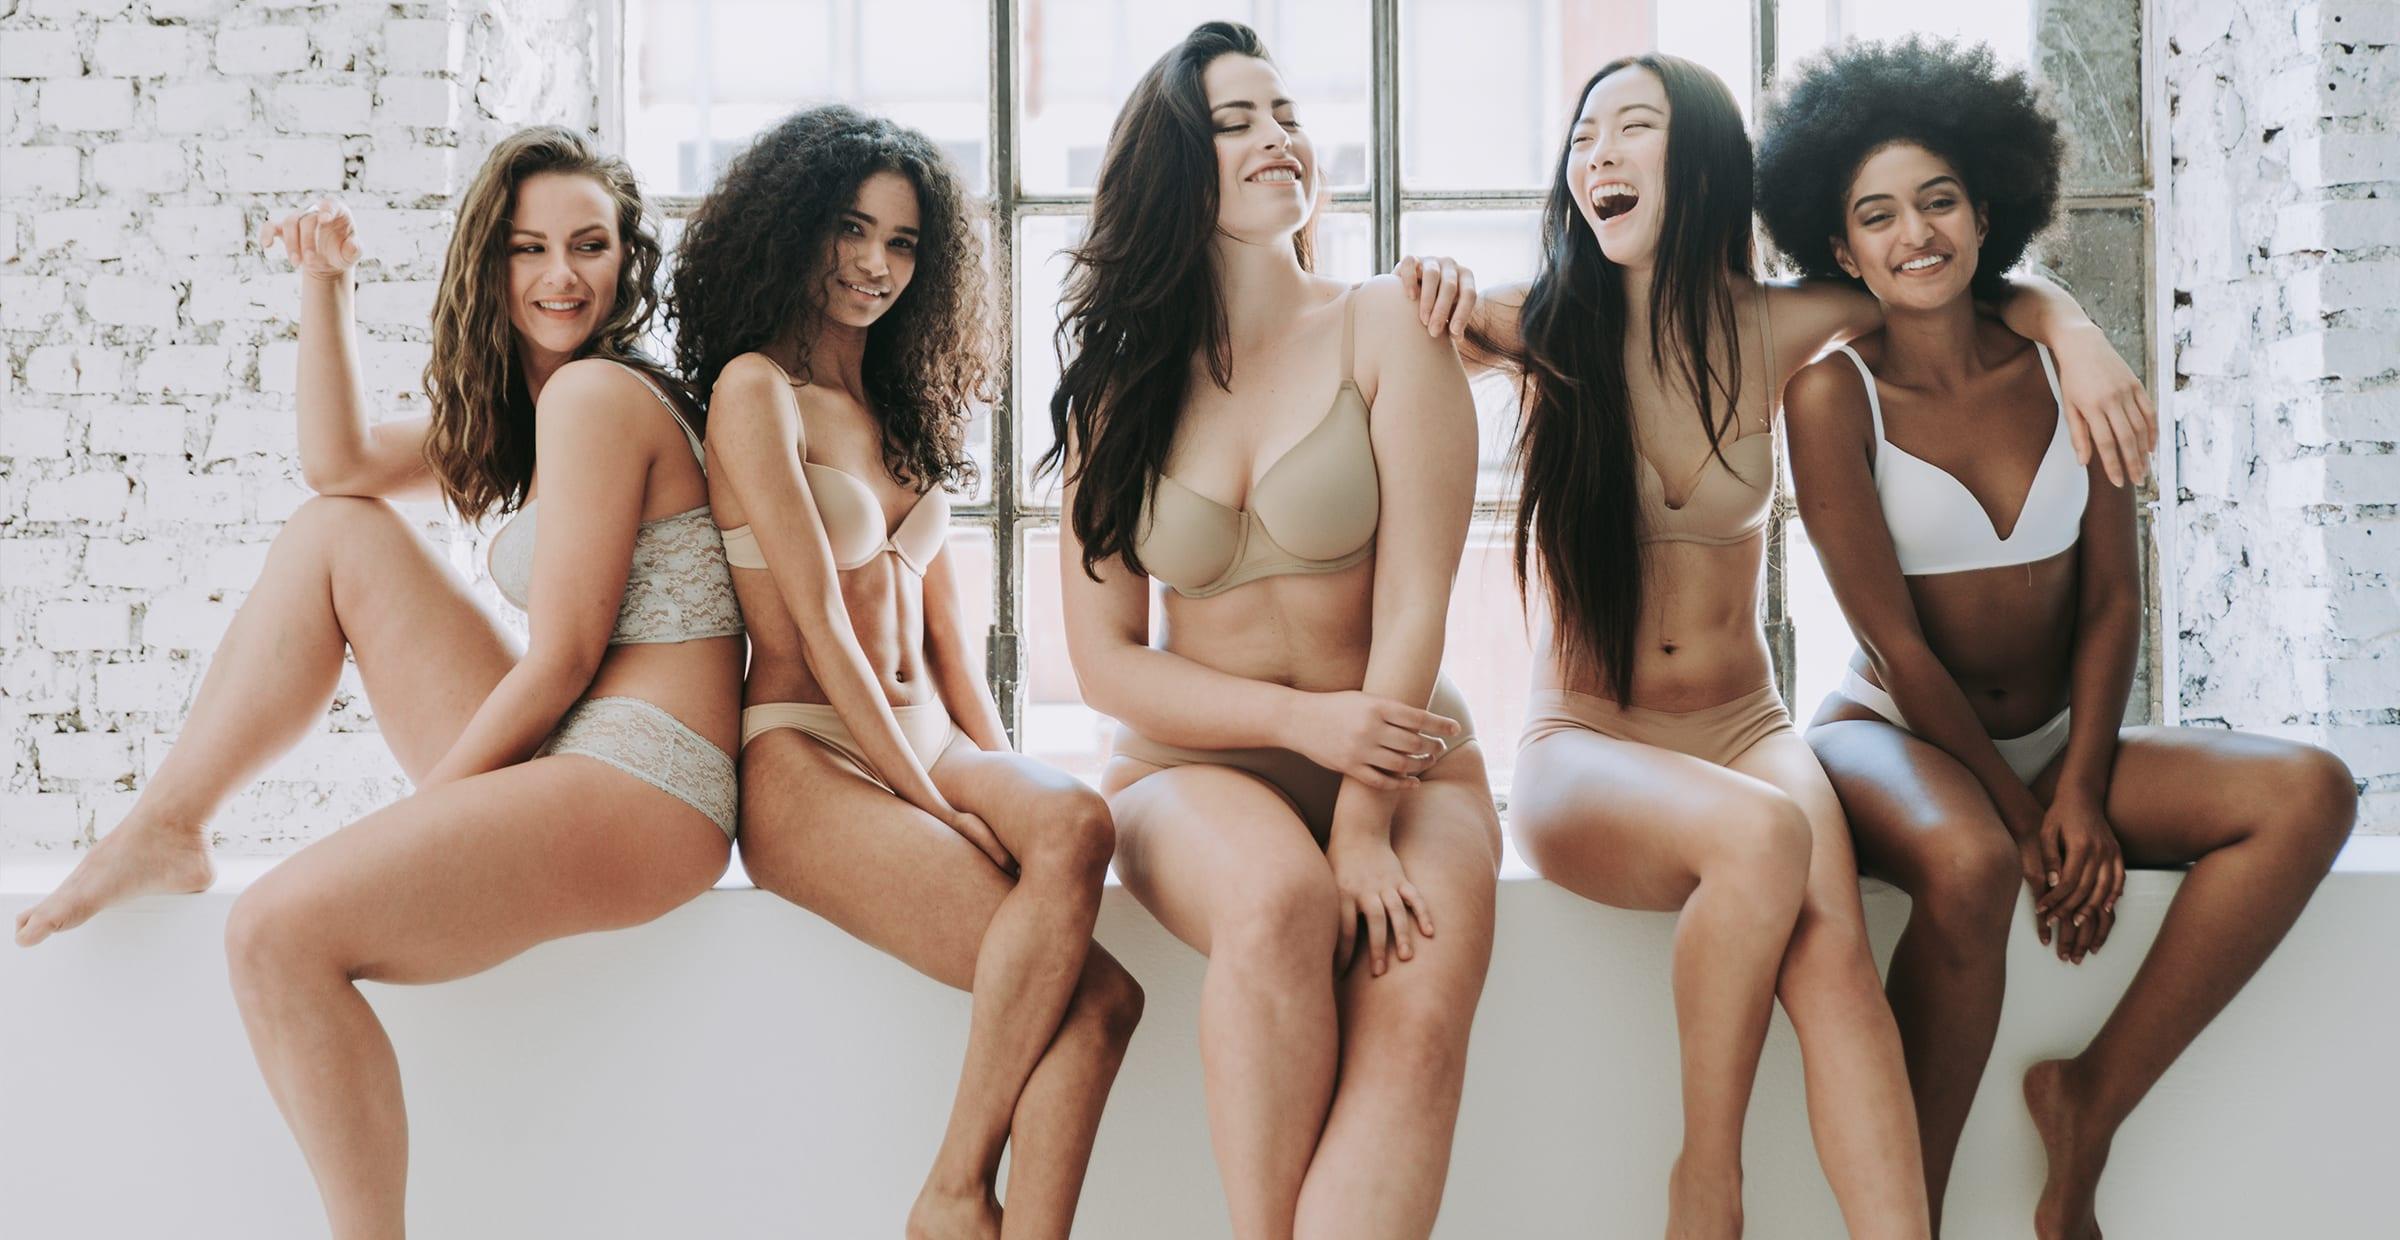 Women in different style bras